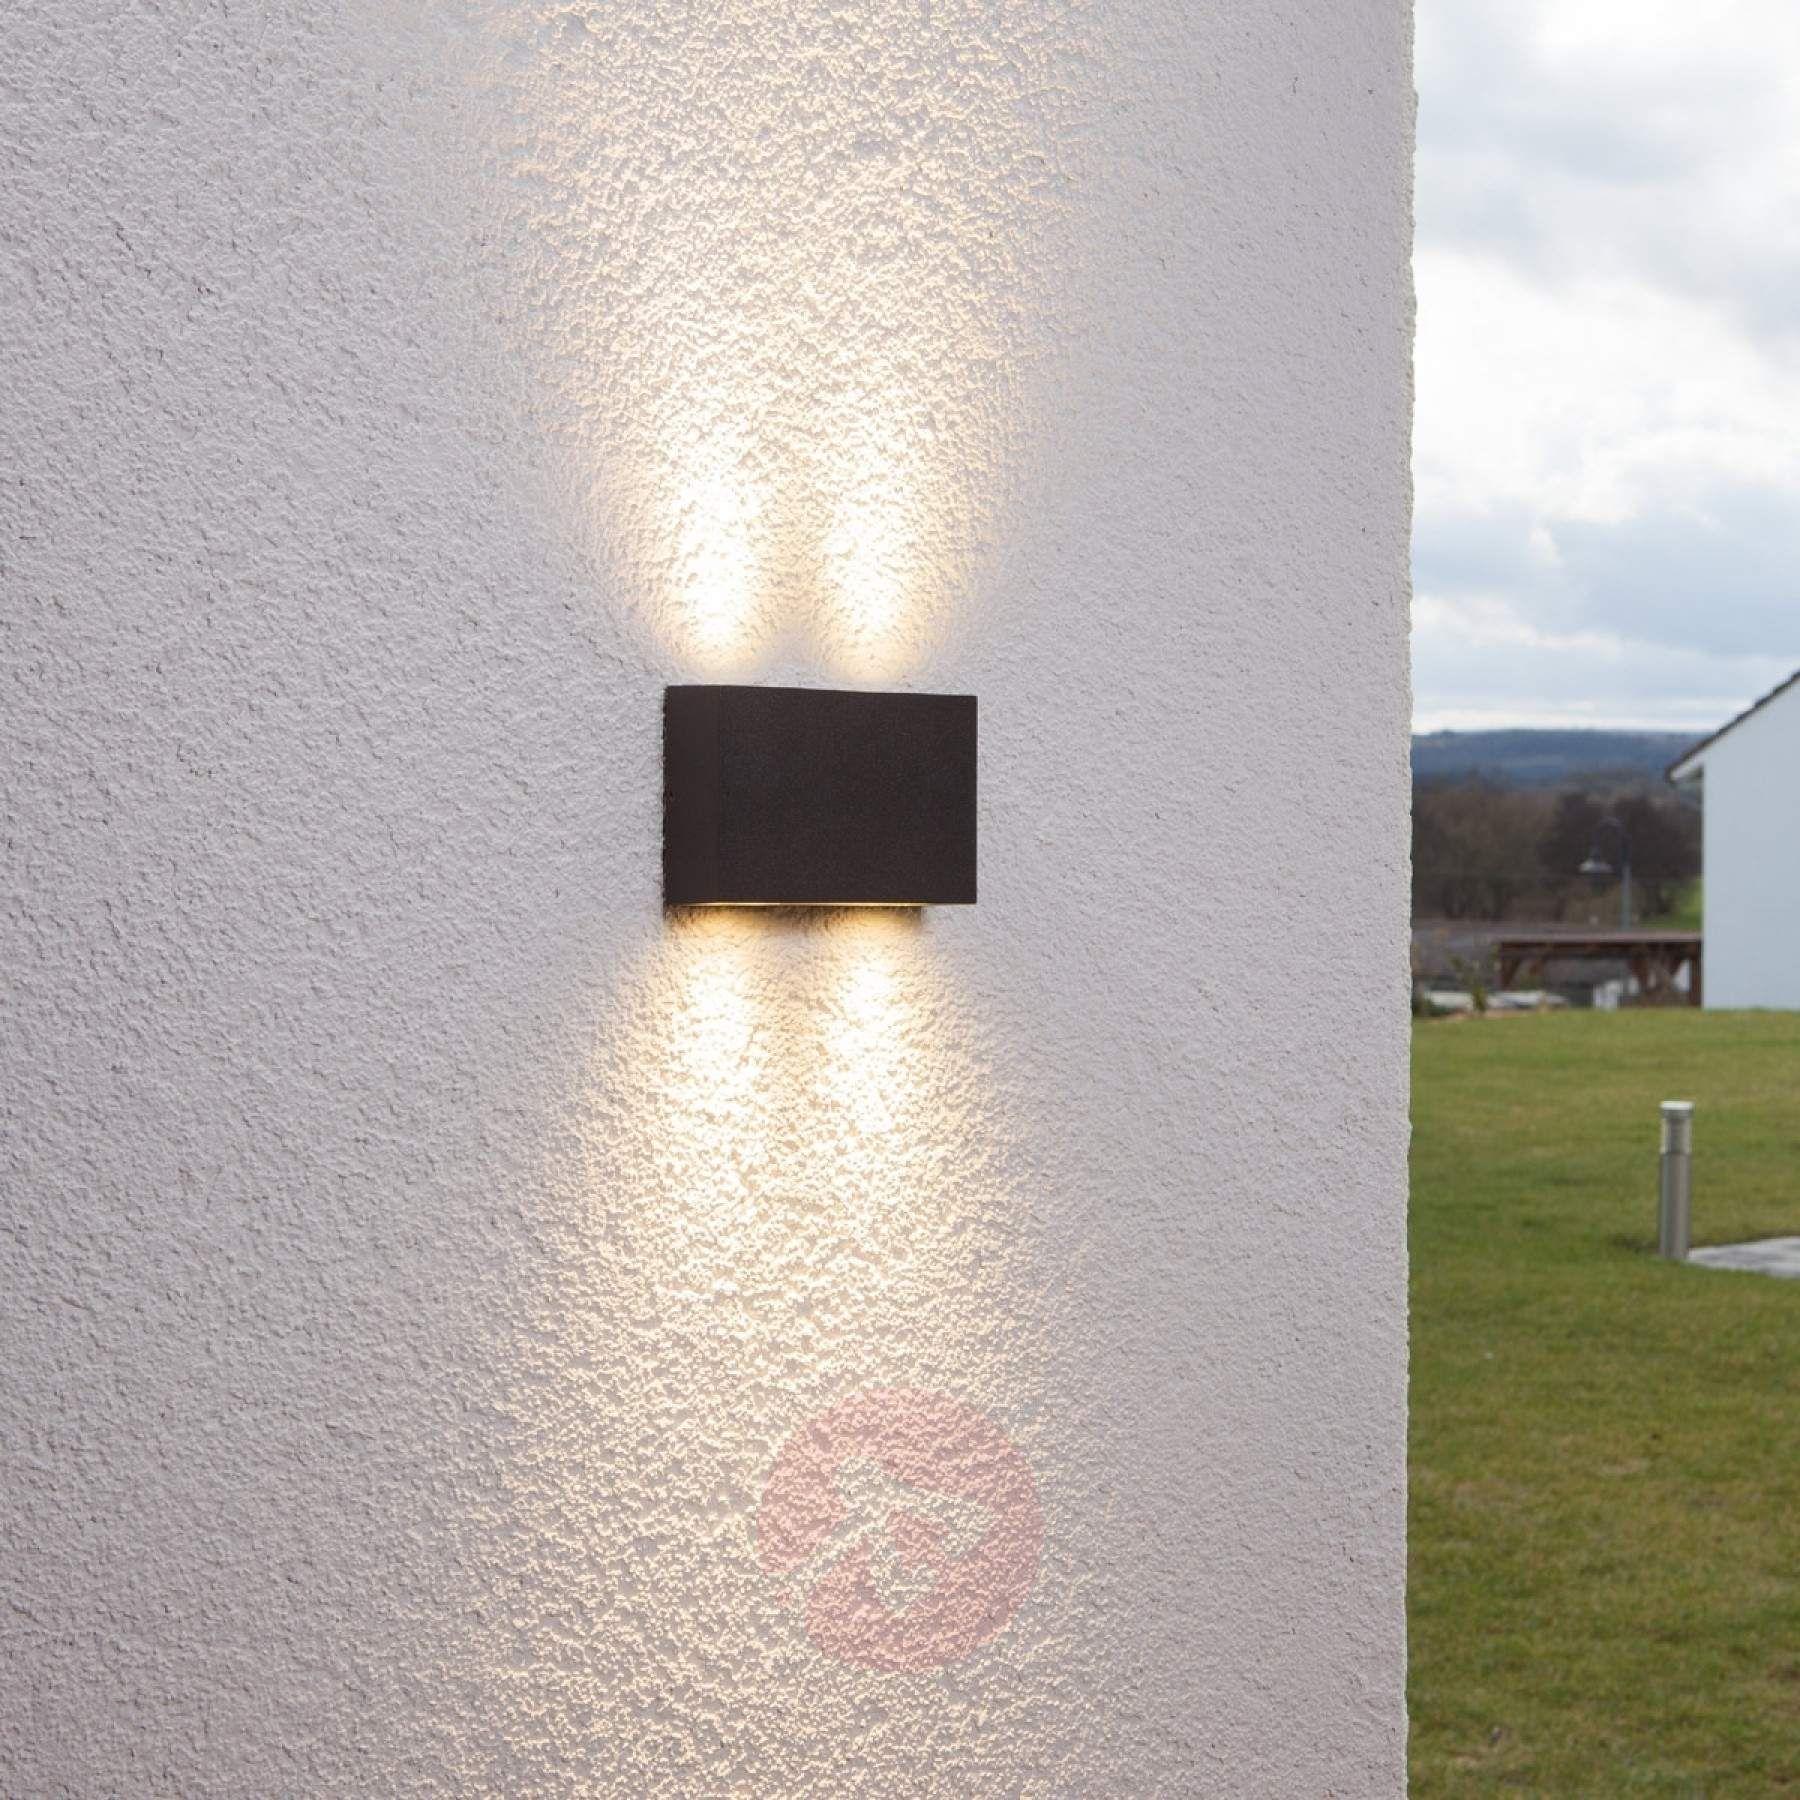 Prostokątna Lampa ścienna Zewnętrzna Henor 4 Led 9616001 02 Outdoor Wall Lighting Wall Lights Outdoor Walls